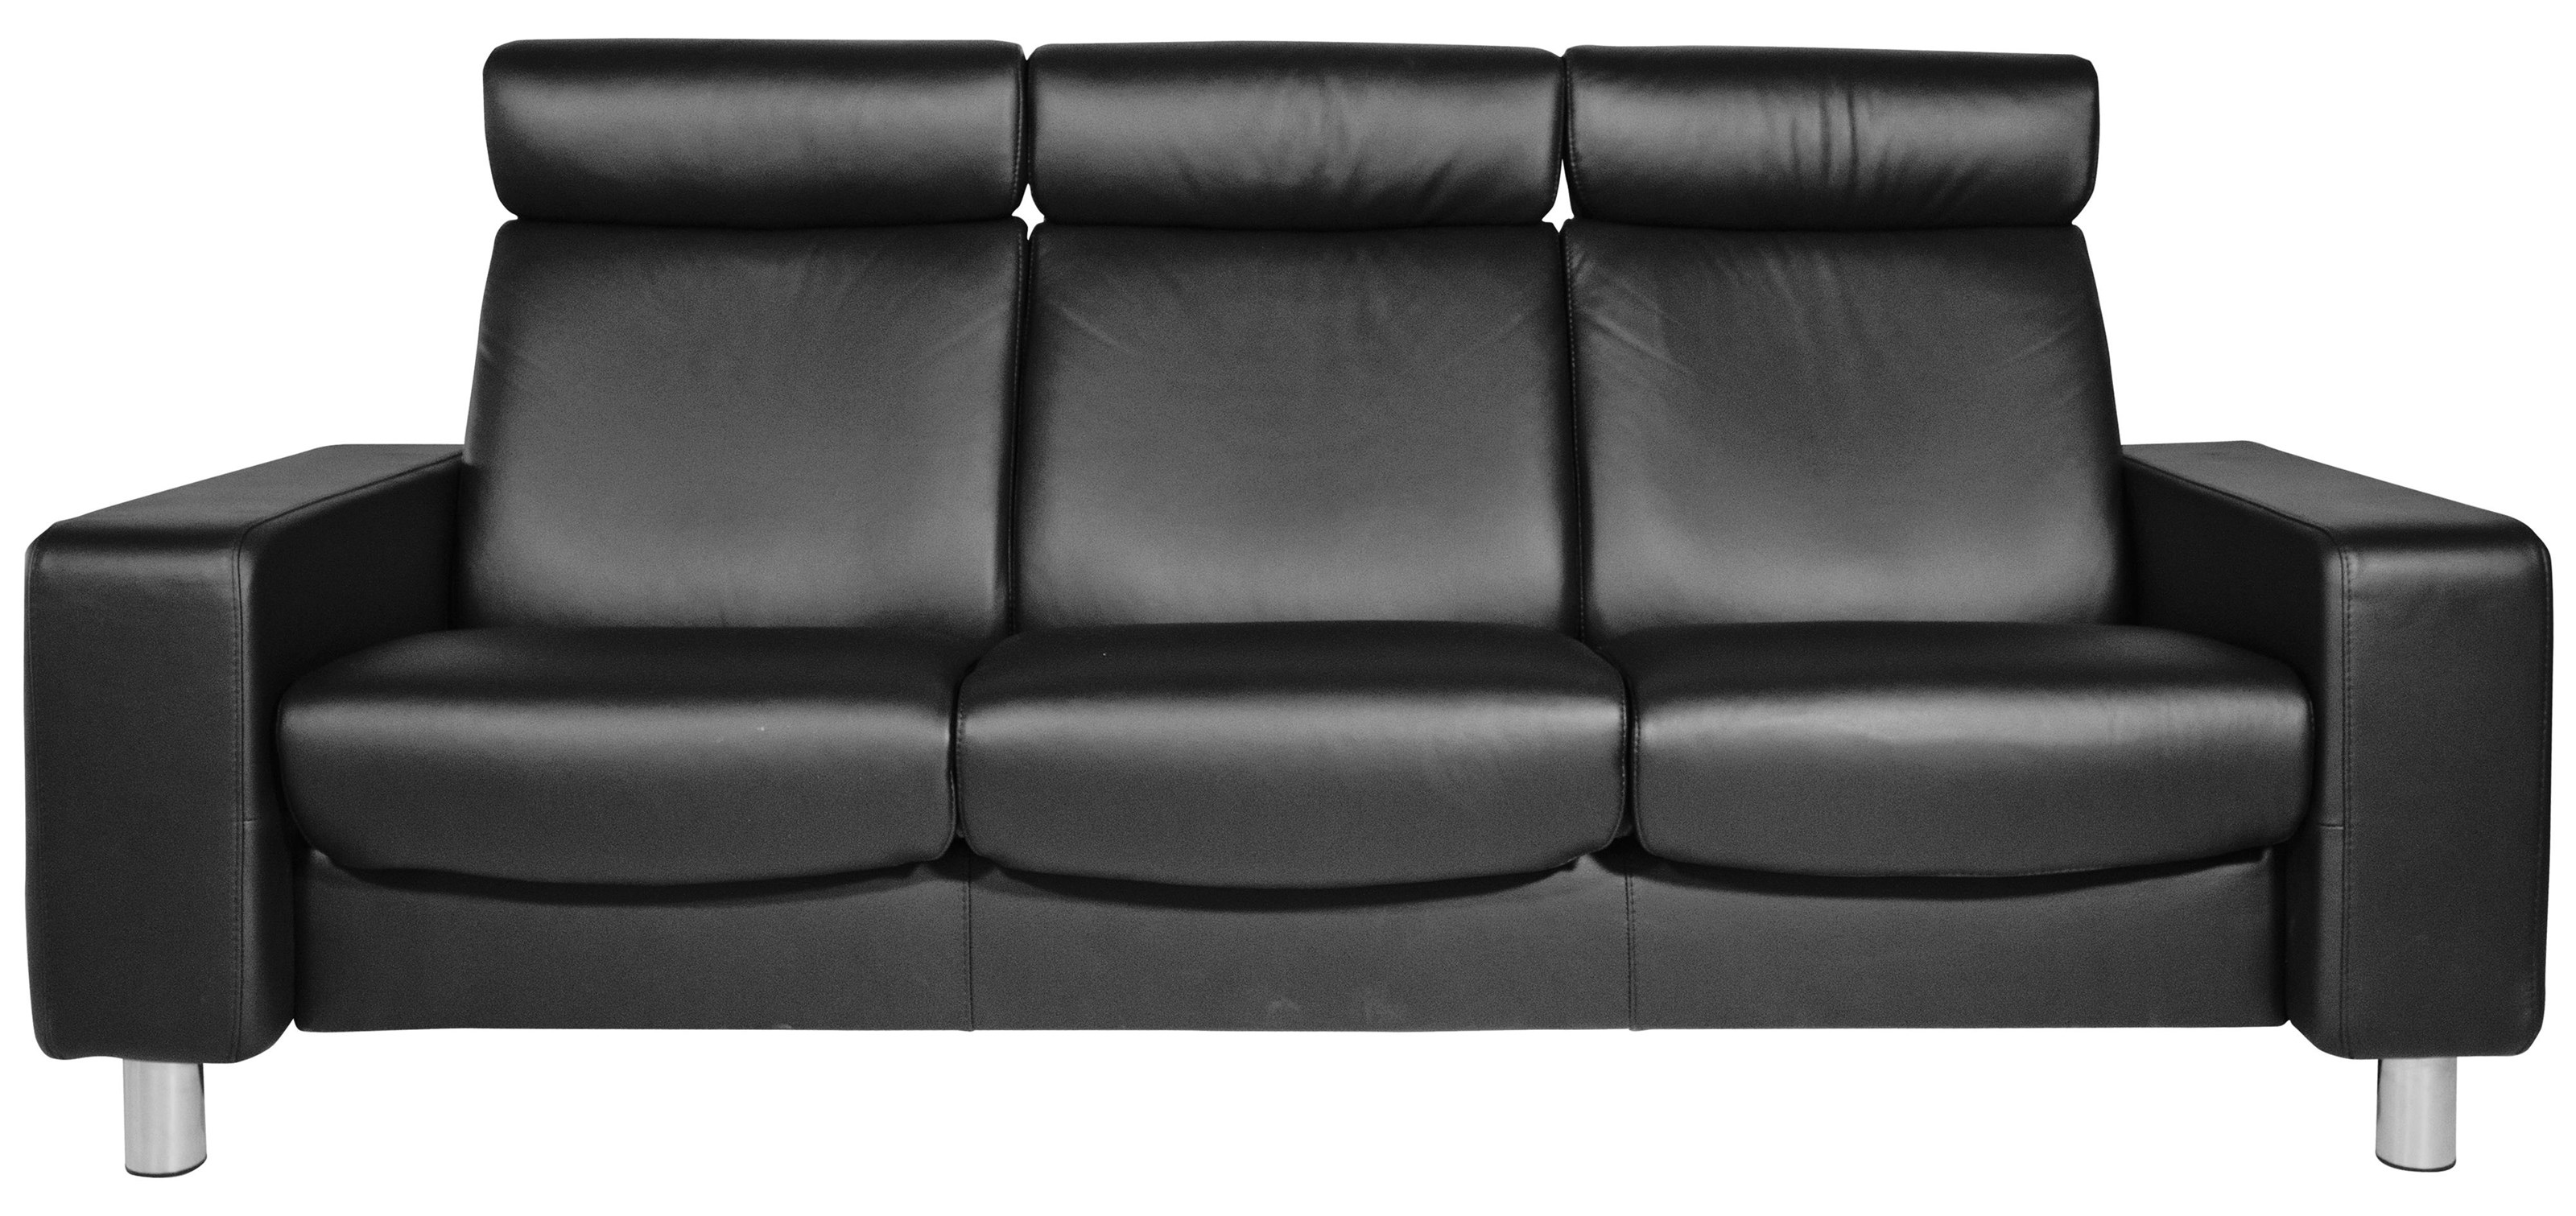 Groovy Stressless Pause Reclining Sofa Inzonedesignstudio Interior Chair Design Inzonedesignstudiocom